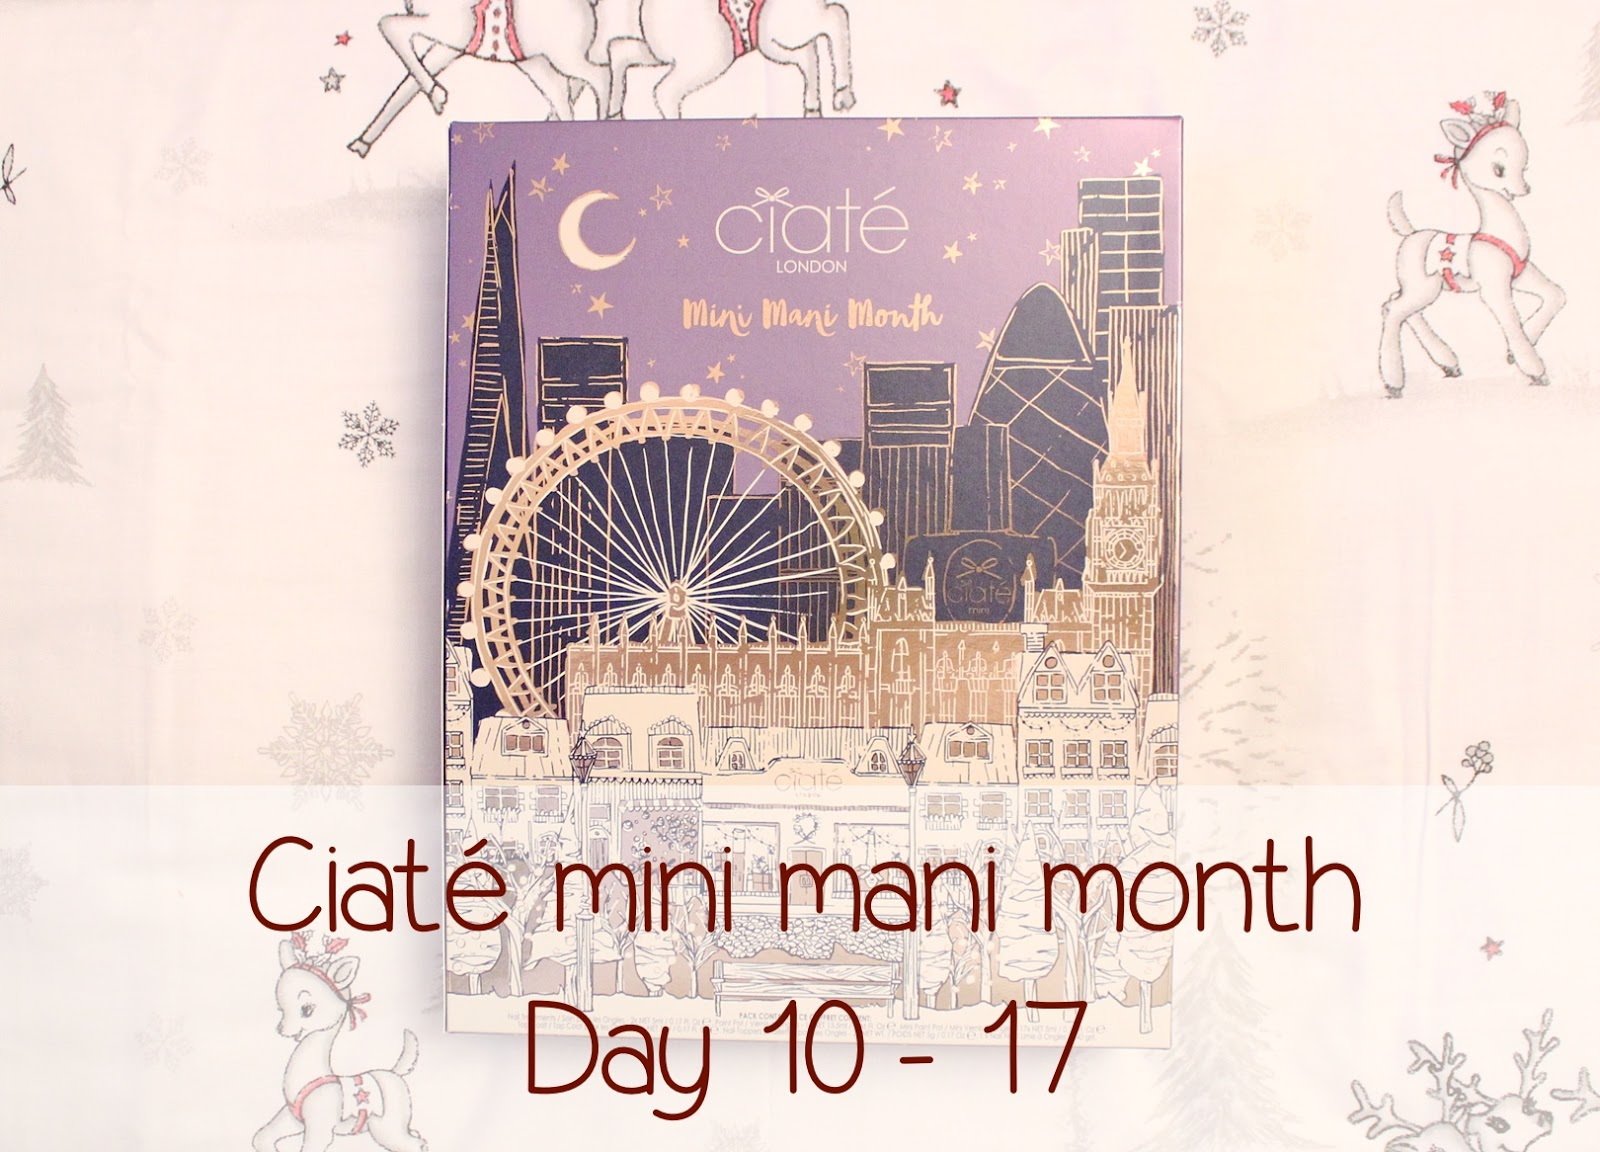 Ciaté Mini Mani Month - Day 10 - 17